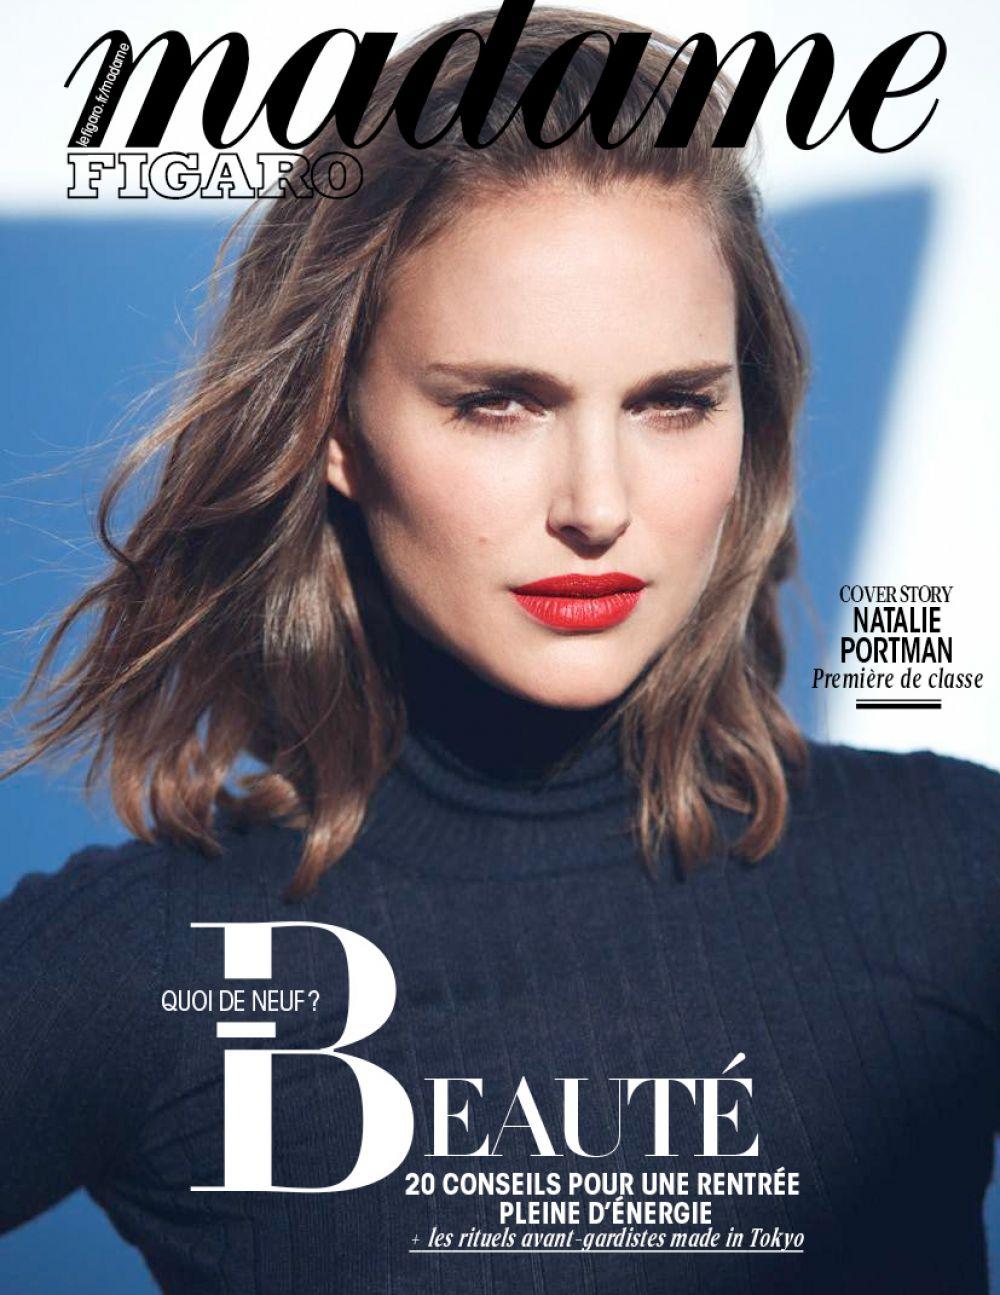 NATALIE PORTMAN for Madame Figaro, September 2017